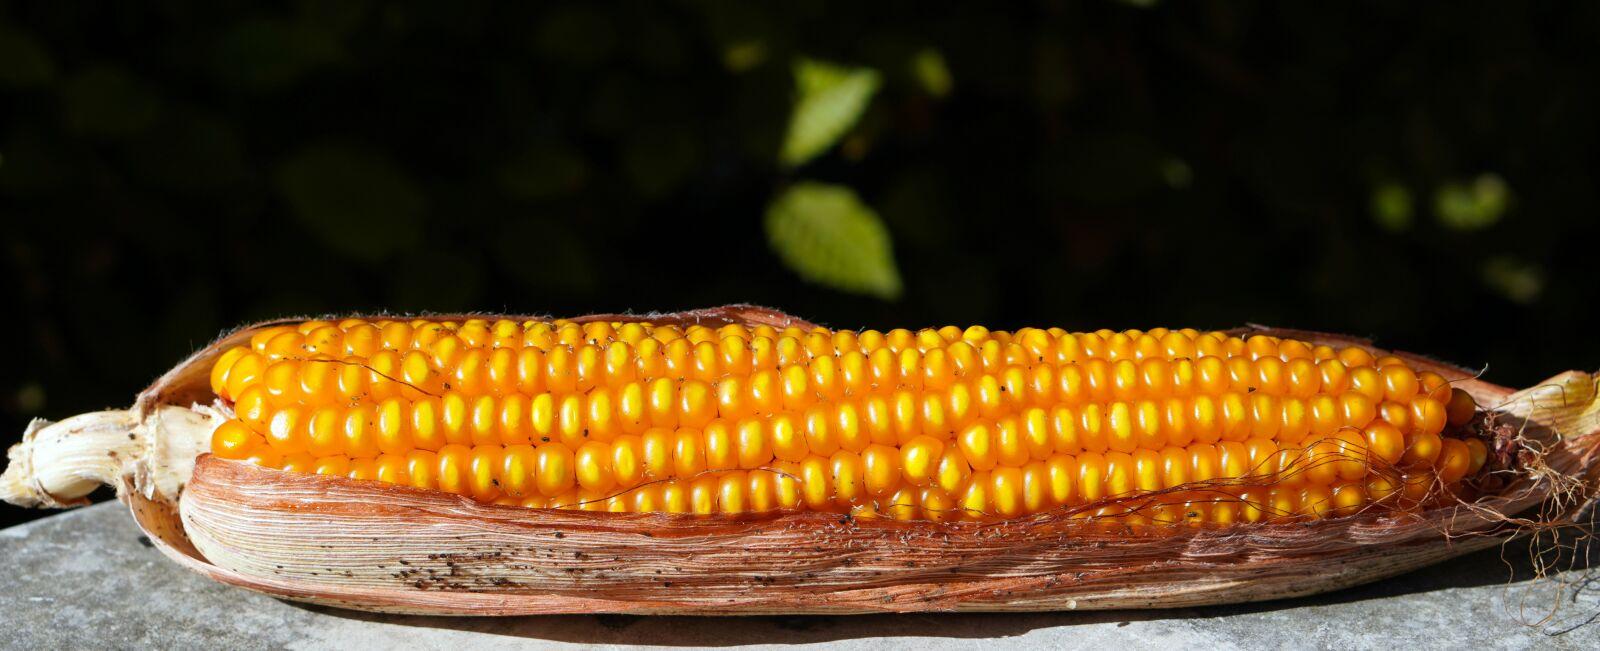 "Sony a6400 sample photo. ""Corn, corn on the"" photography"